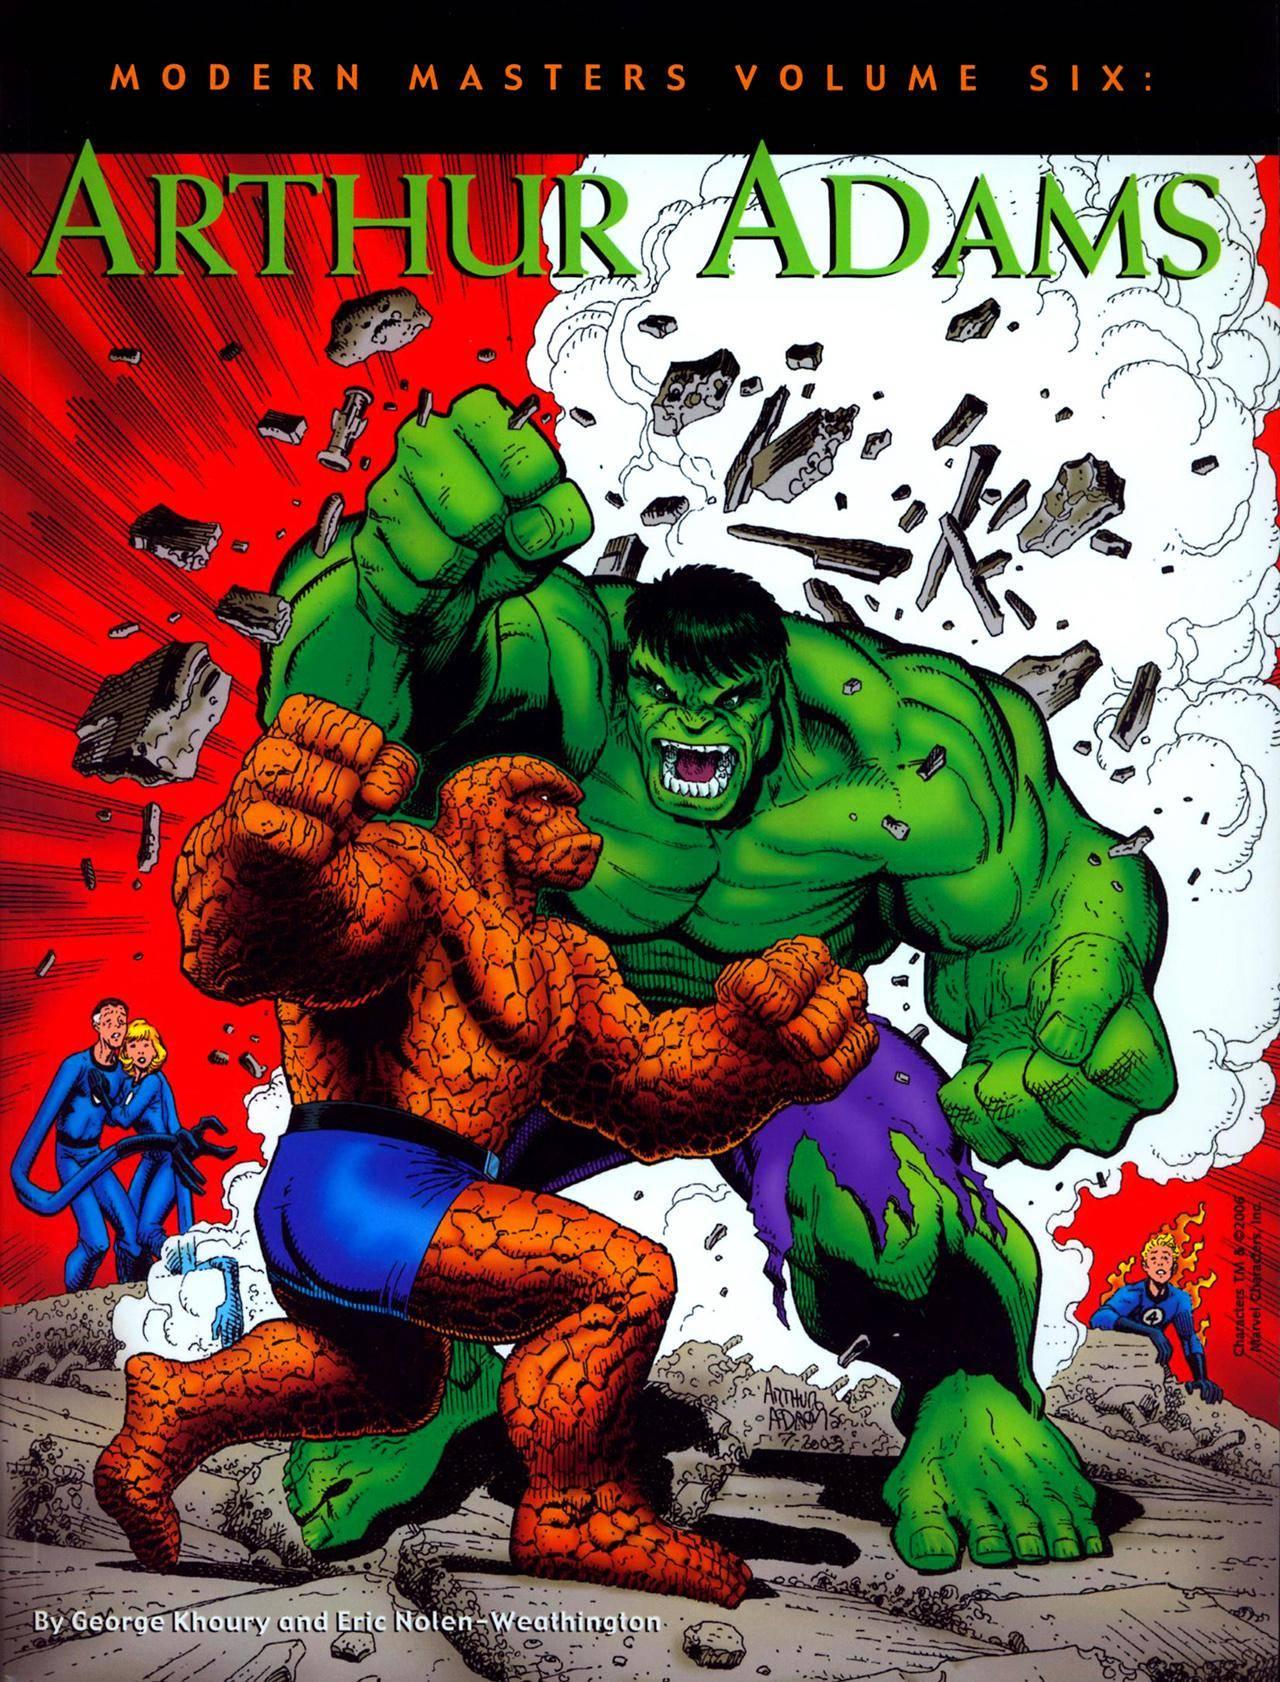 Modern Masters Vol 06 - Arthur Adams Bchry - DCP